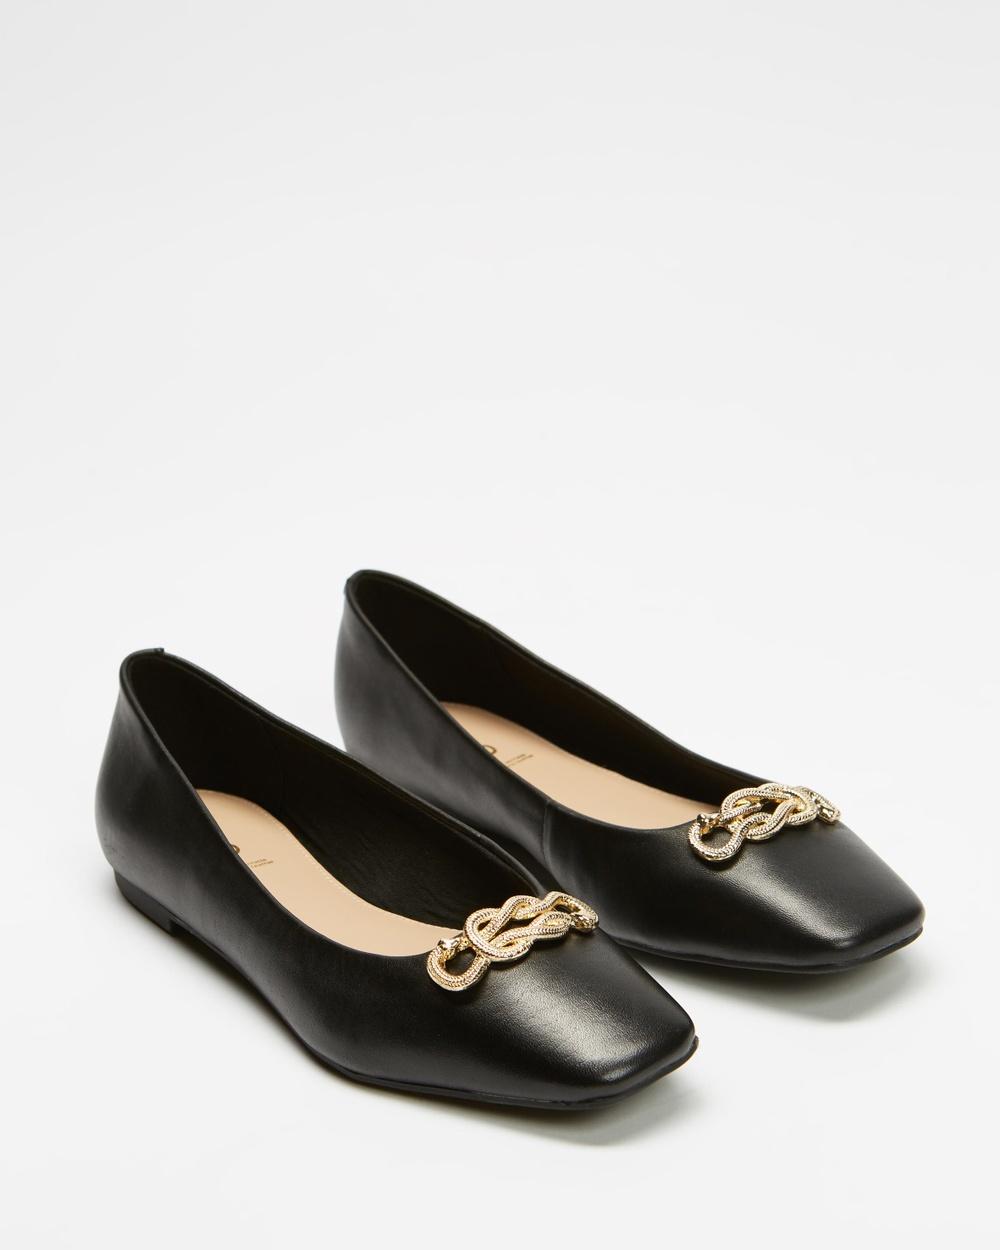 ALDO Lothauvia Ballet Flats Black